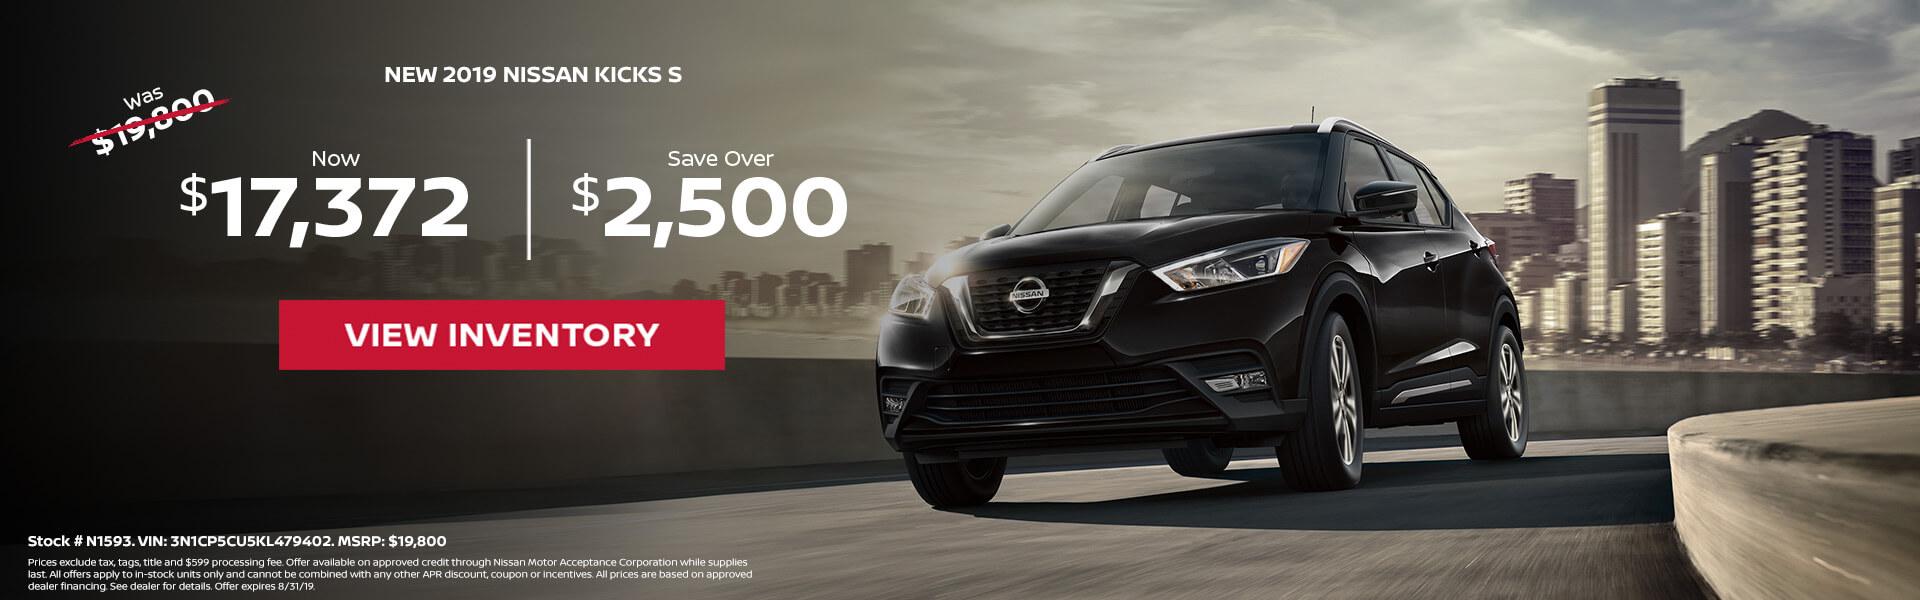 Nissan Kicks $17,372 Purchase